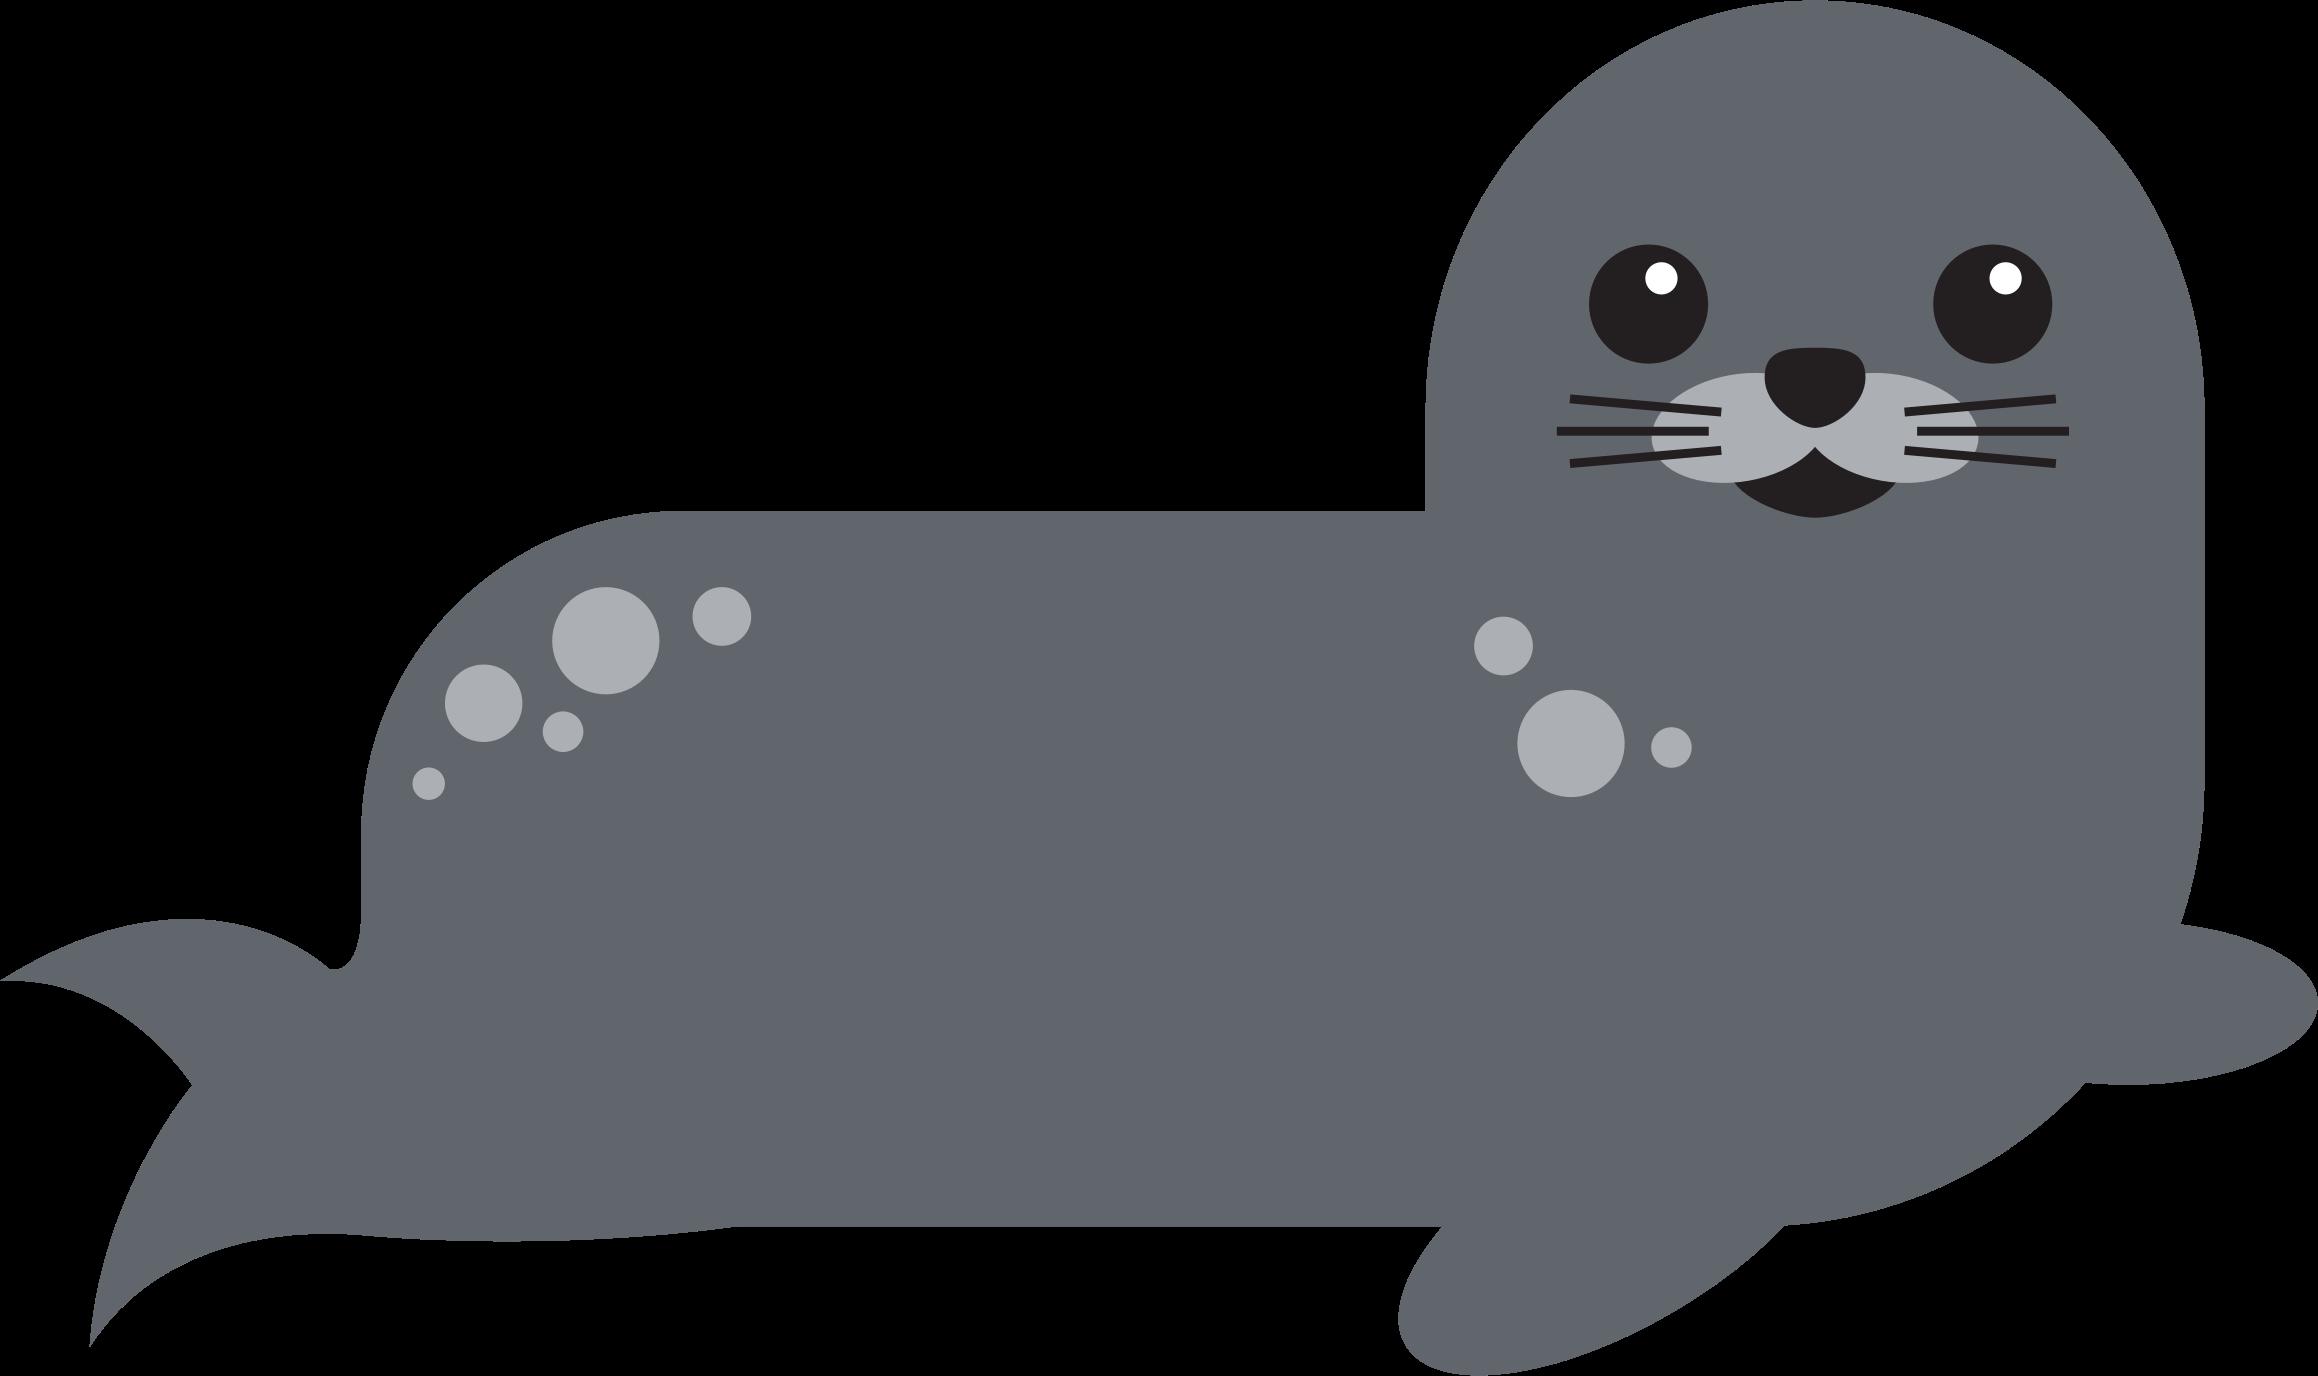 Harbor Seal 2 by GDJ